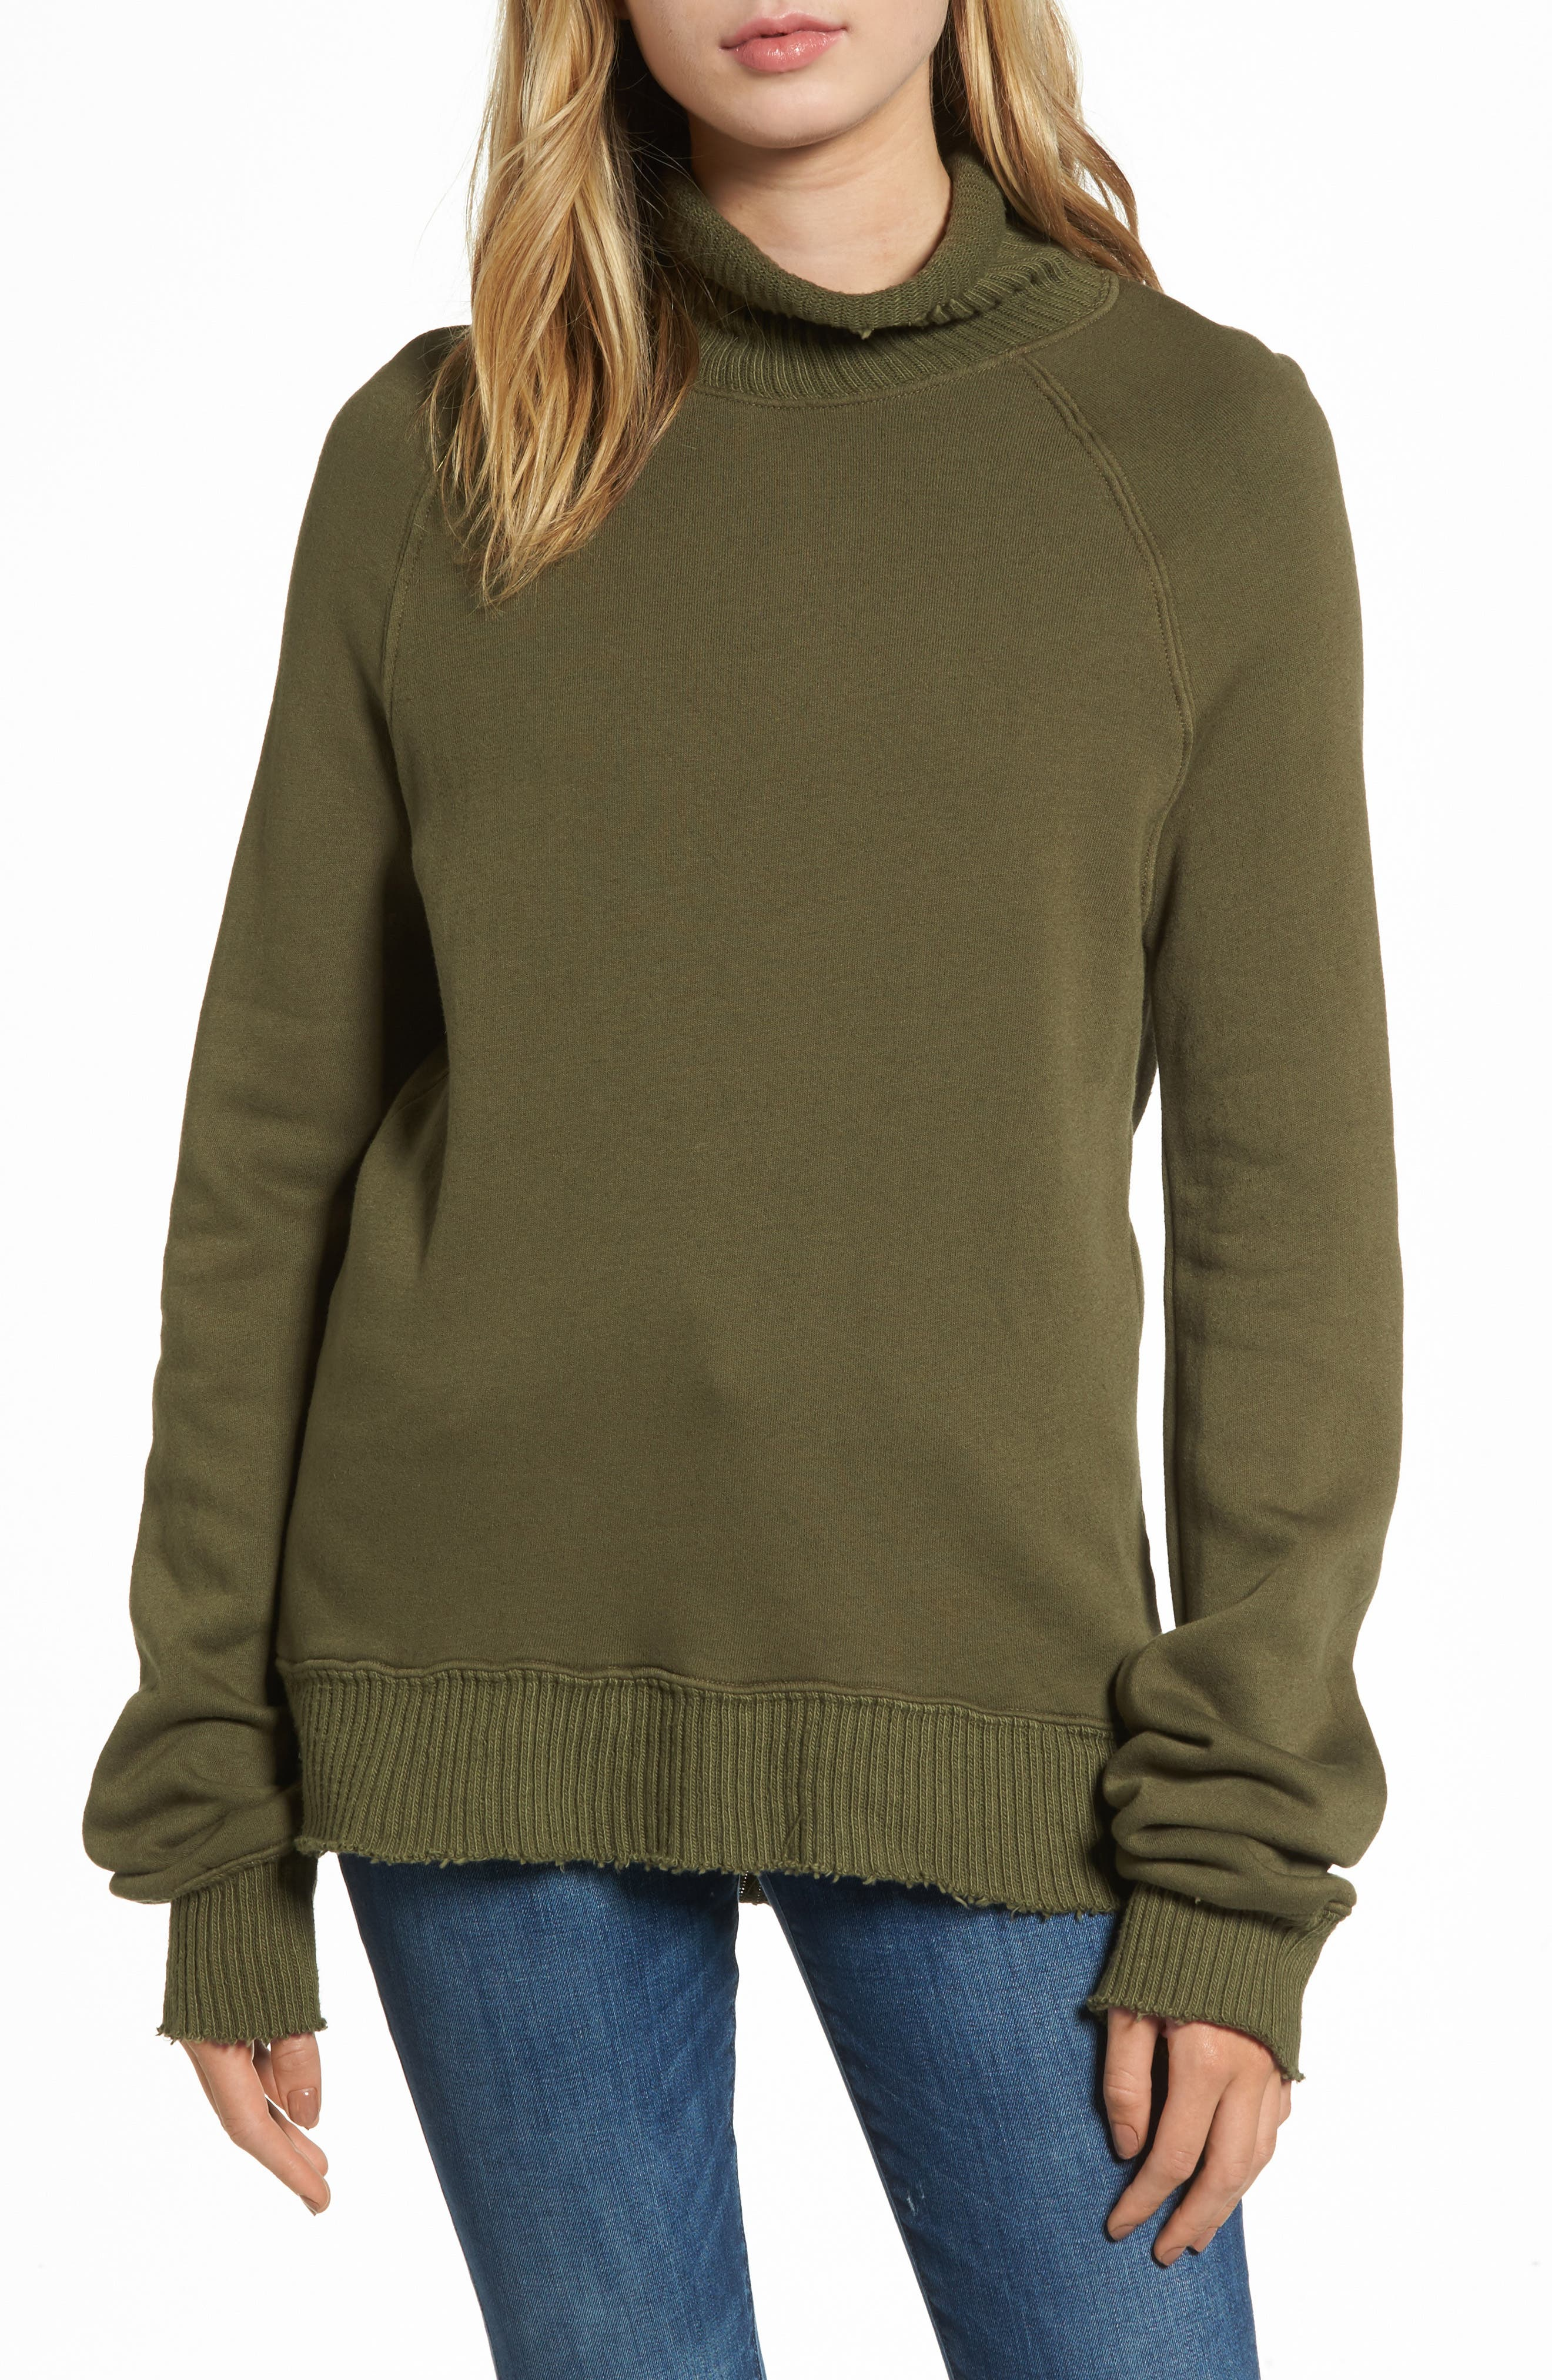 Distressed Fleece Turtleneck Sweatshirt,                             Main thumbnail 1, color,                             317